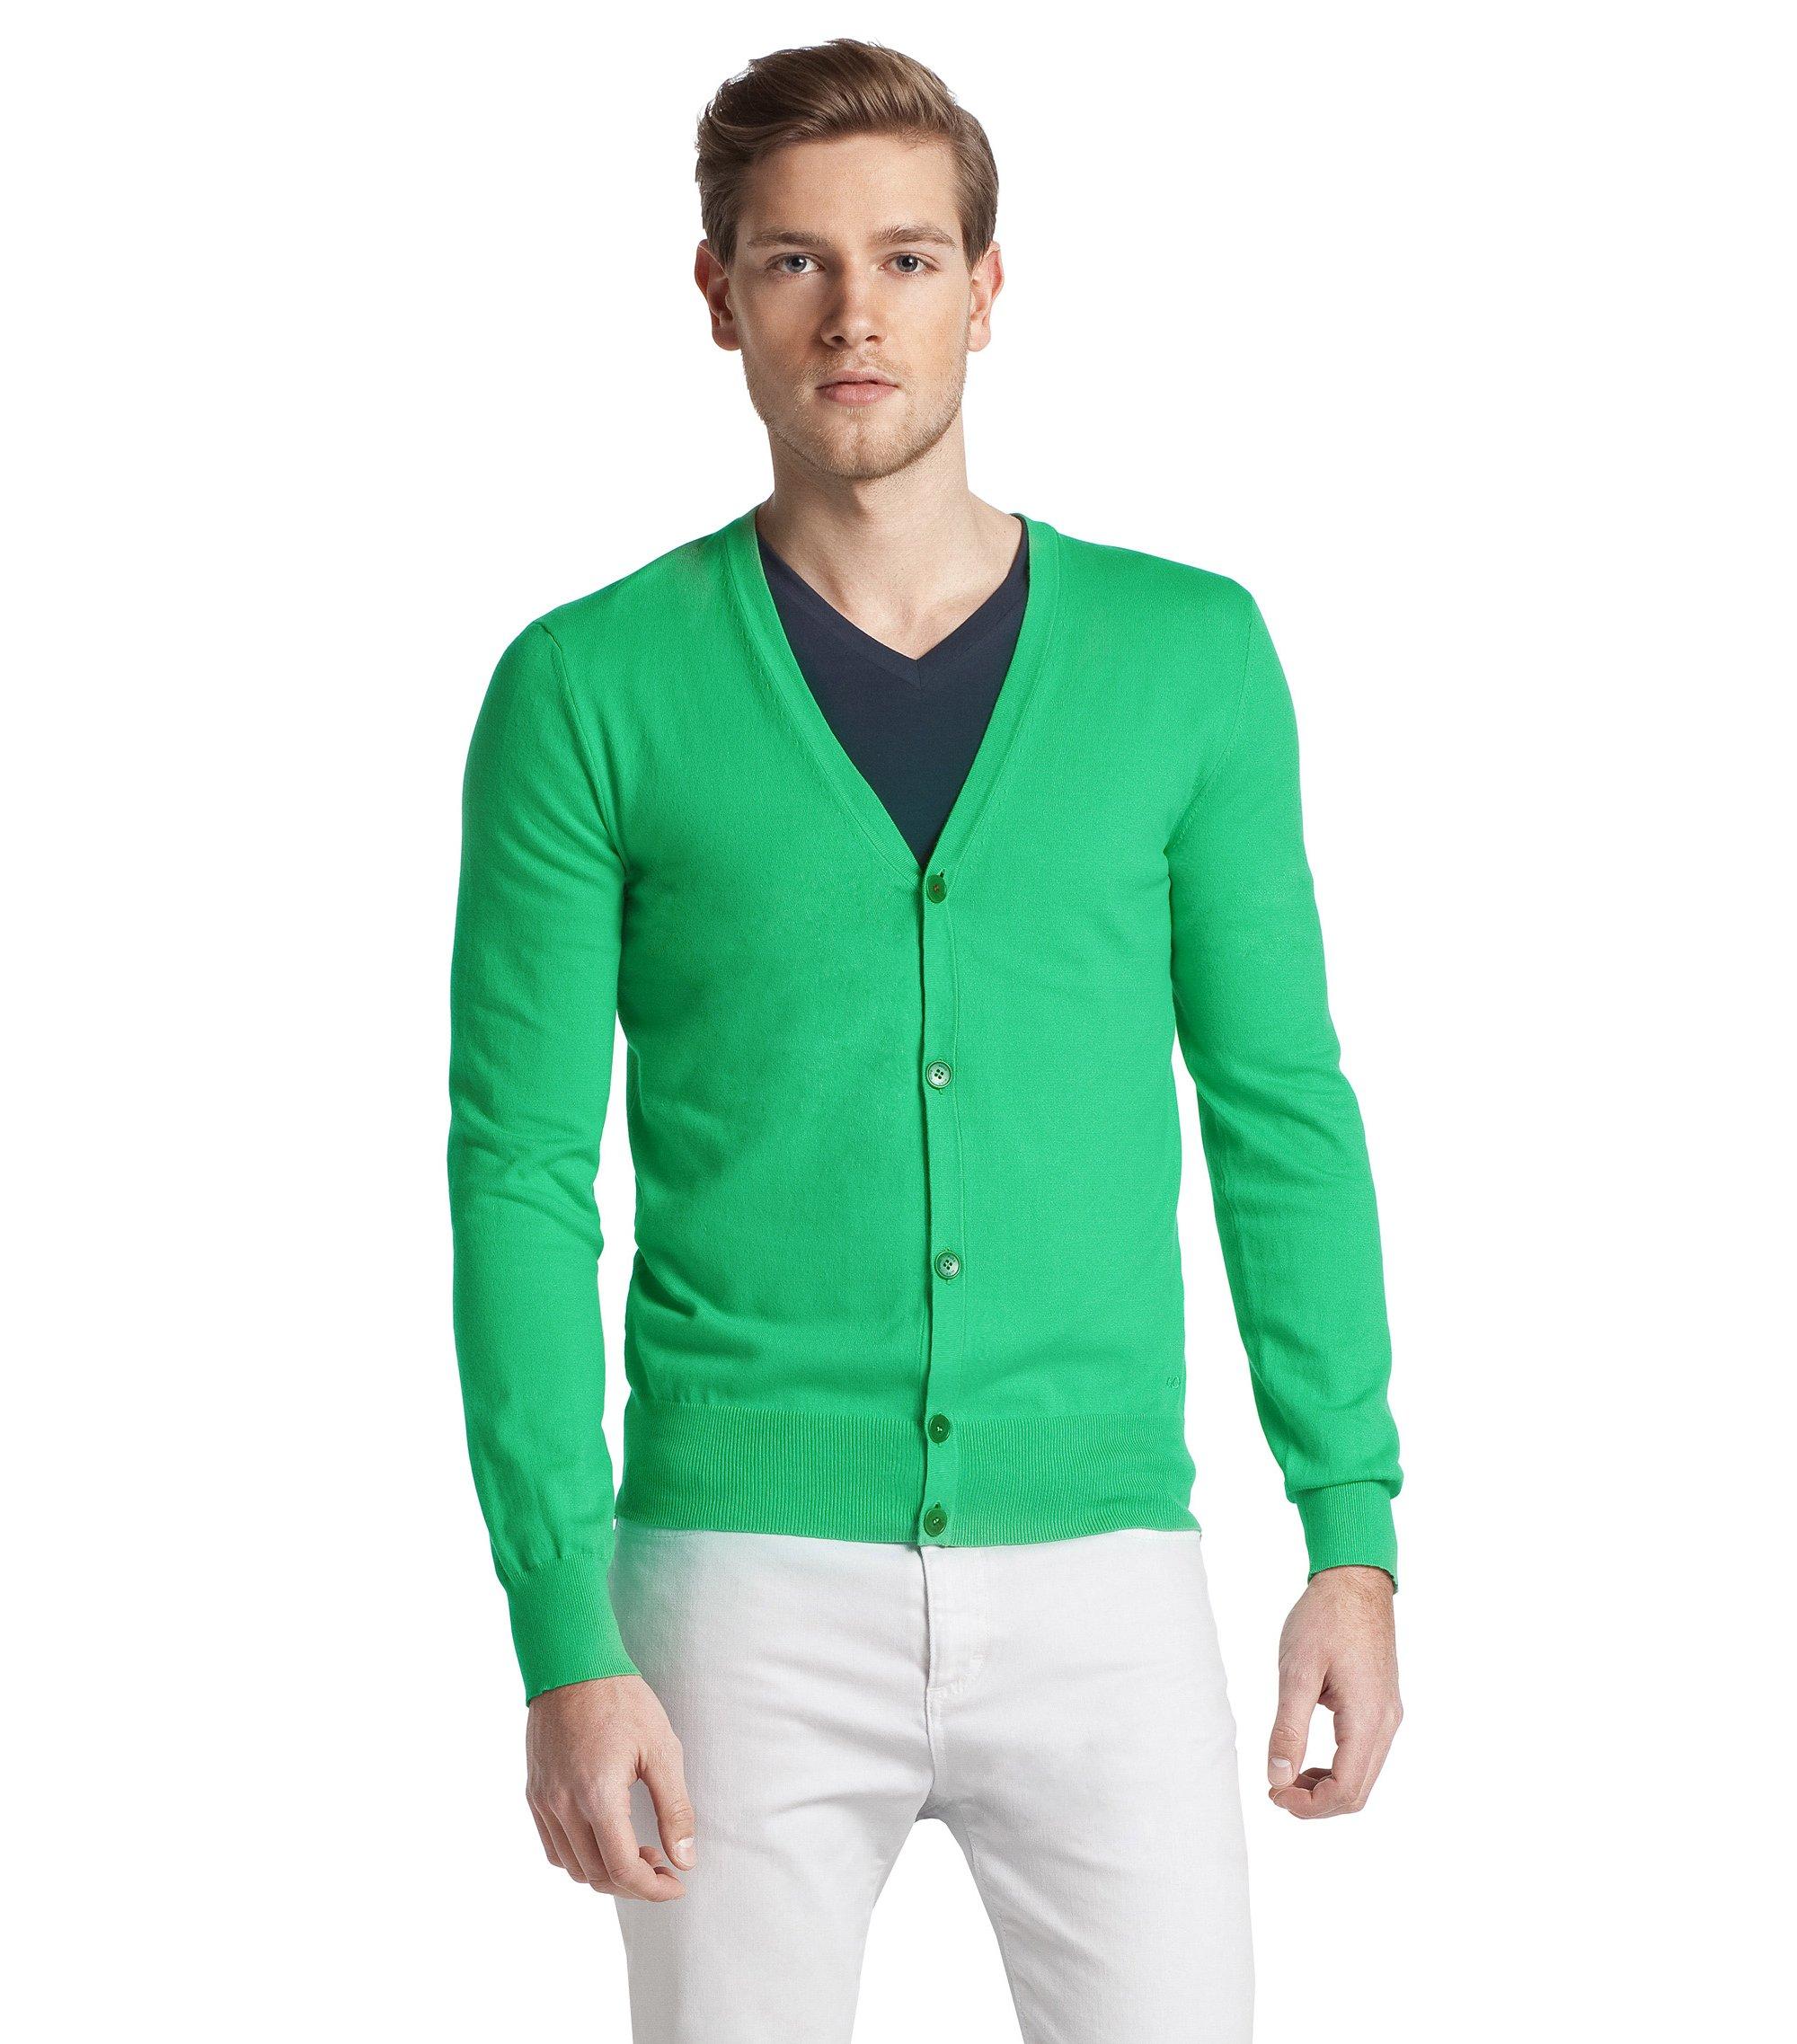 Cardigan ´Samiro` aus Baumwoll-Stretch, Grün